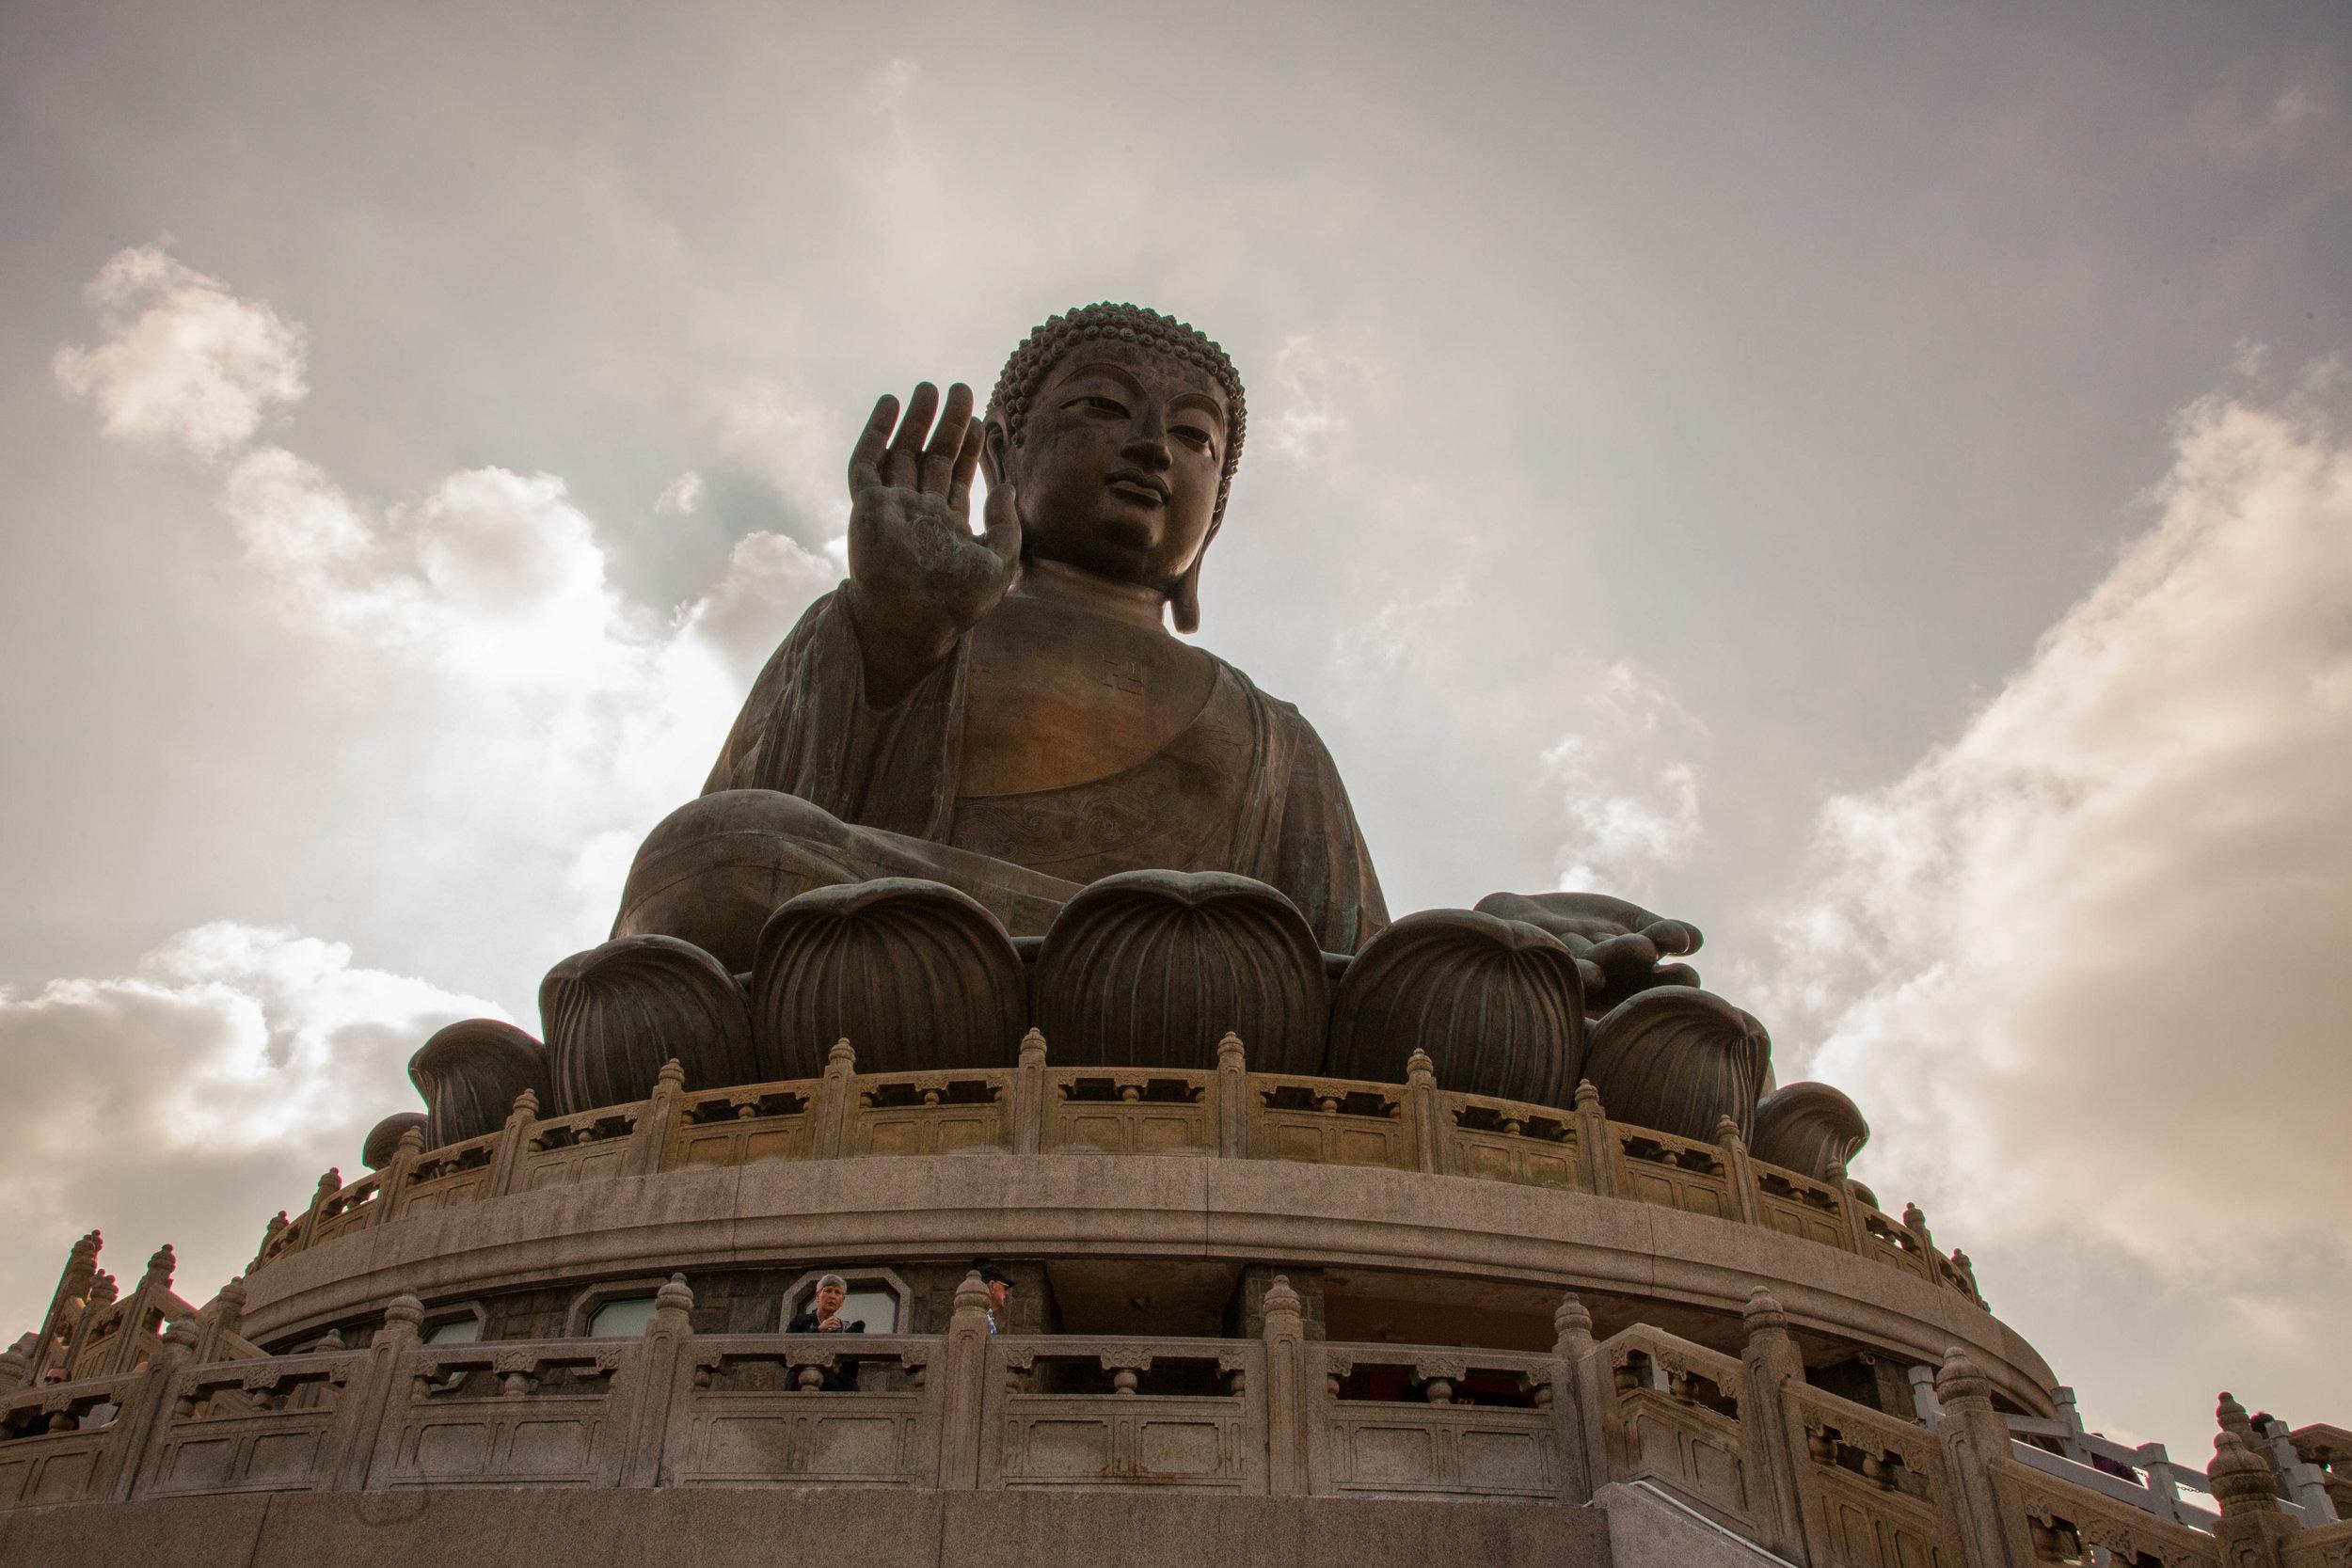 The Big Buddha up close.